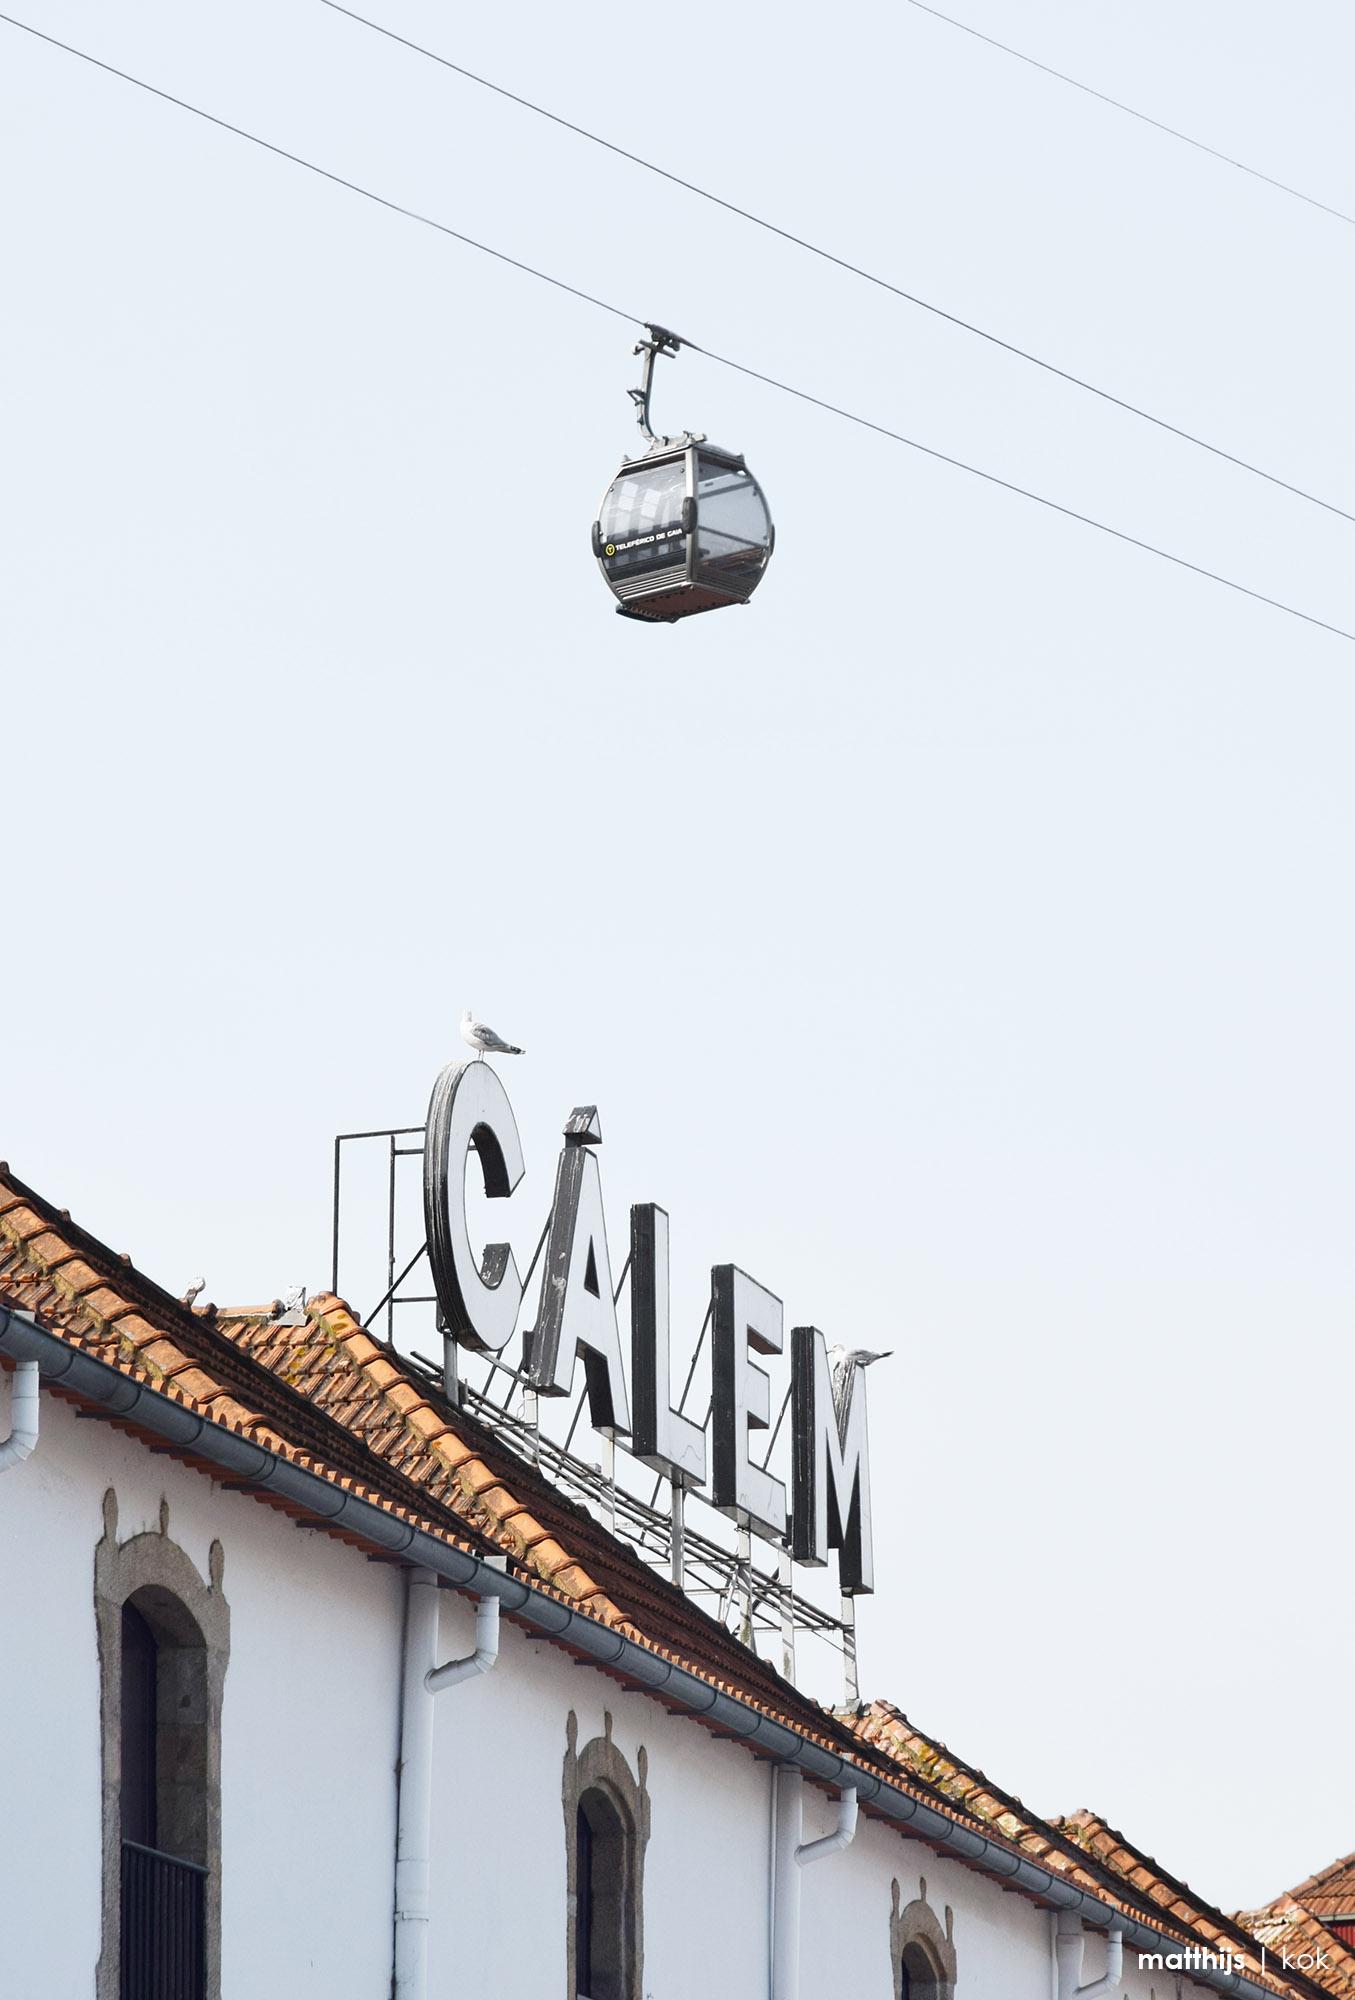 Calem Port, Portugal | Photography by Matthijs Kok